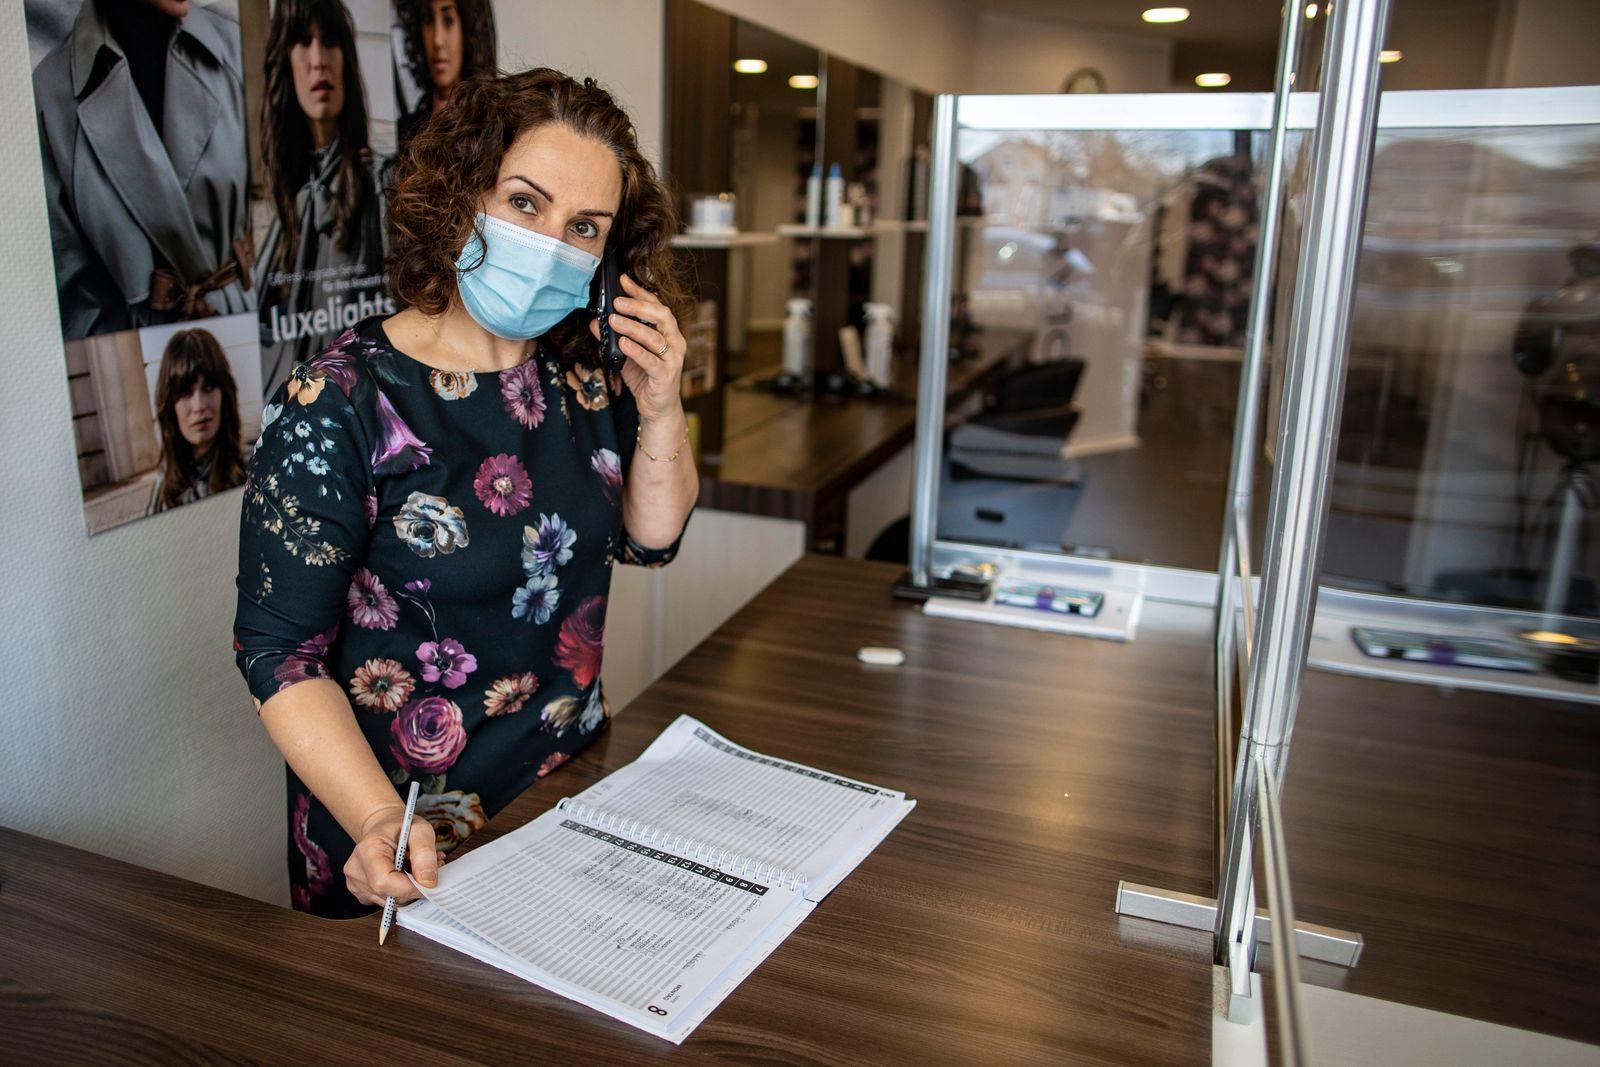 Coronavirus - Duisburg - Friseursalon versteigert Termin